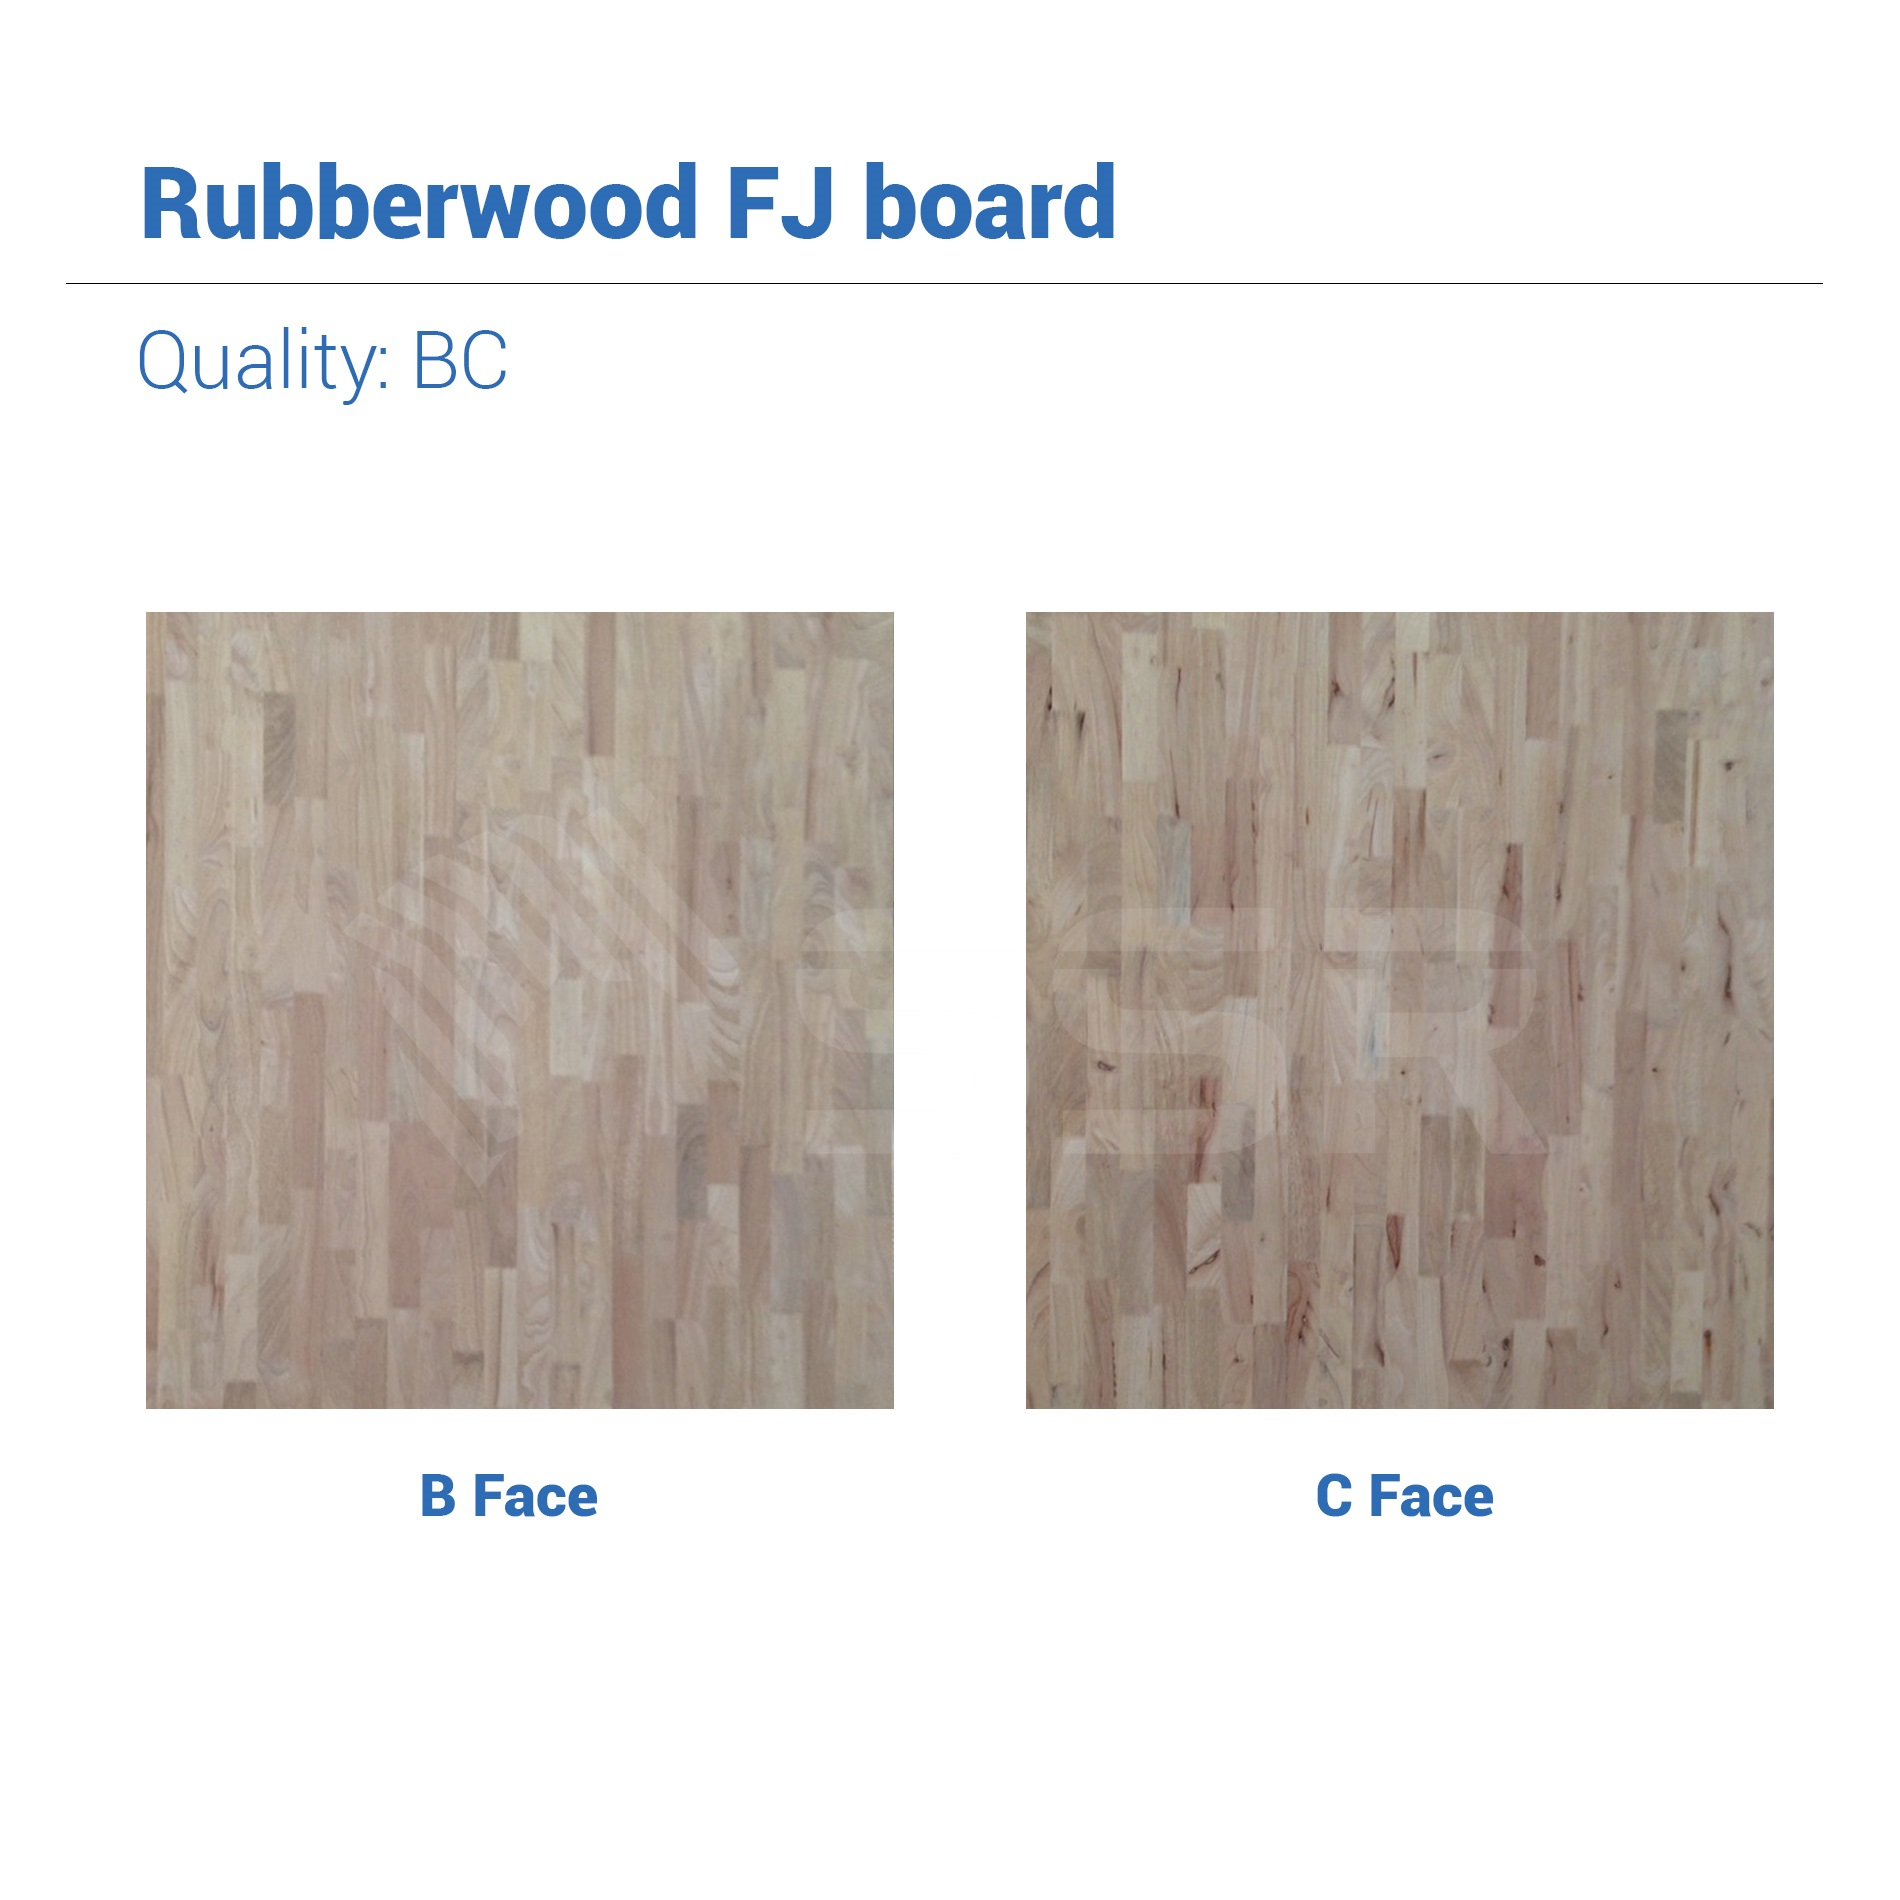 Rubberwood Solid Wood Hard Wood Wood Joint Wood Plank Wood Panel Wood Board Wood Industry International Wood Product Supplier FSC Certified Import Export